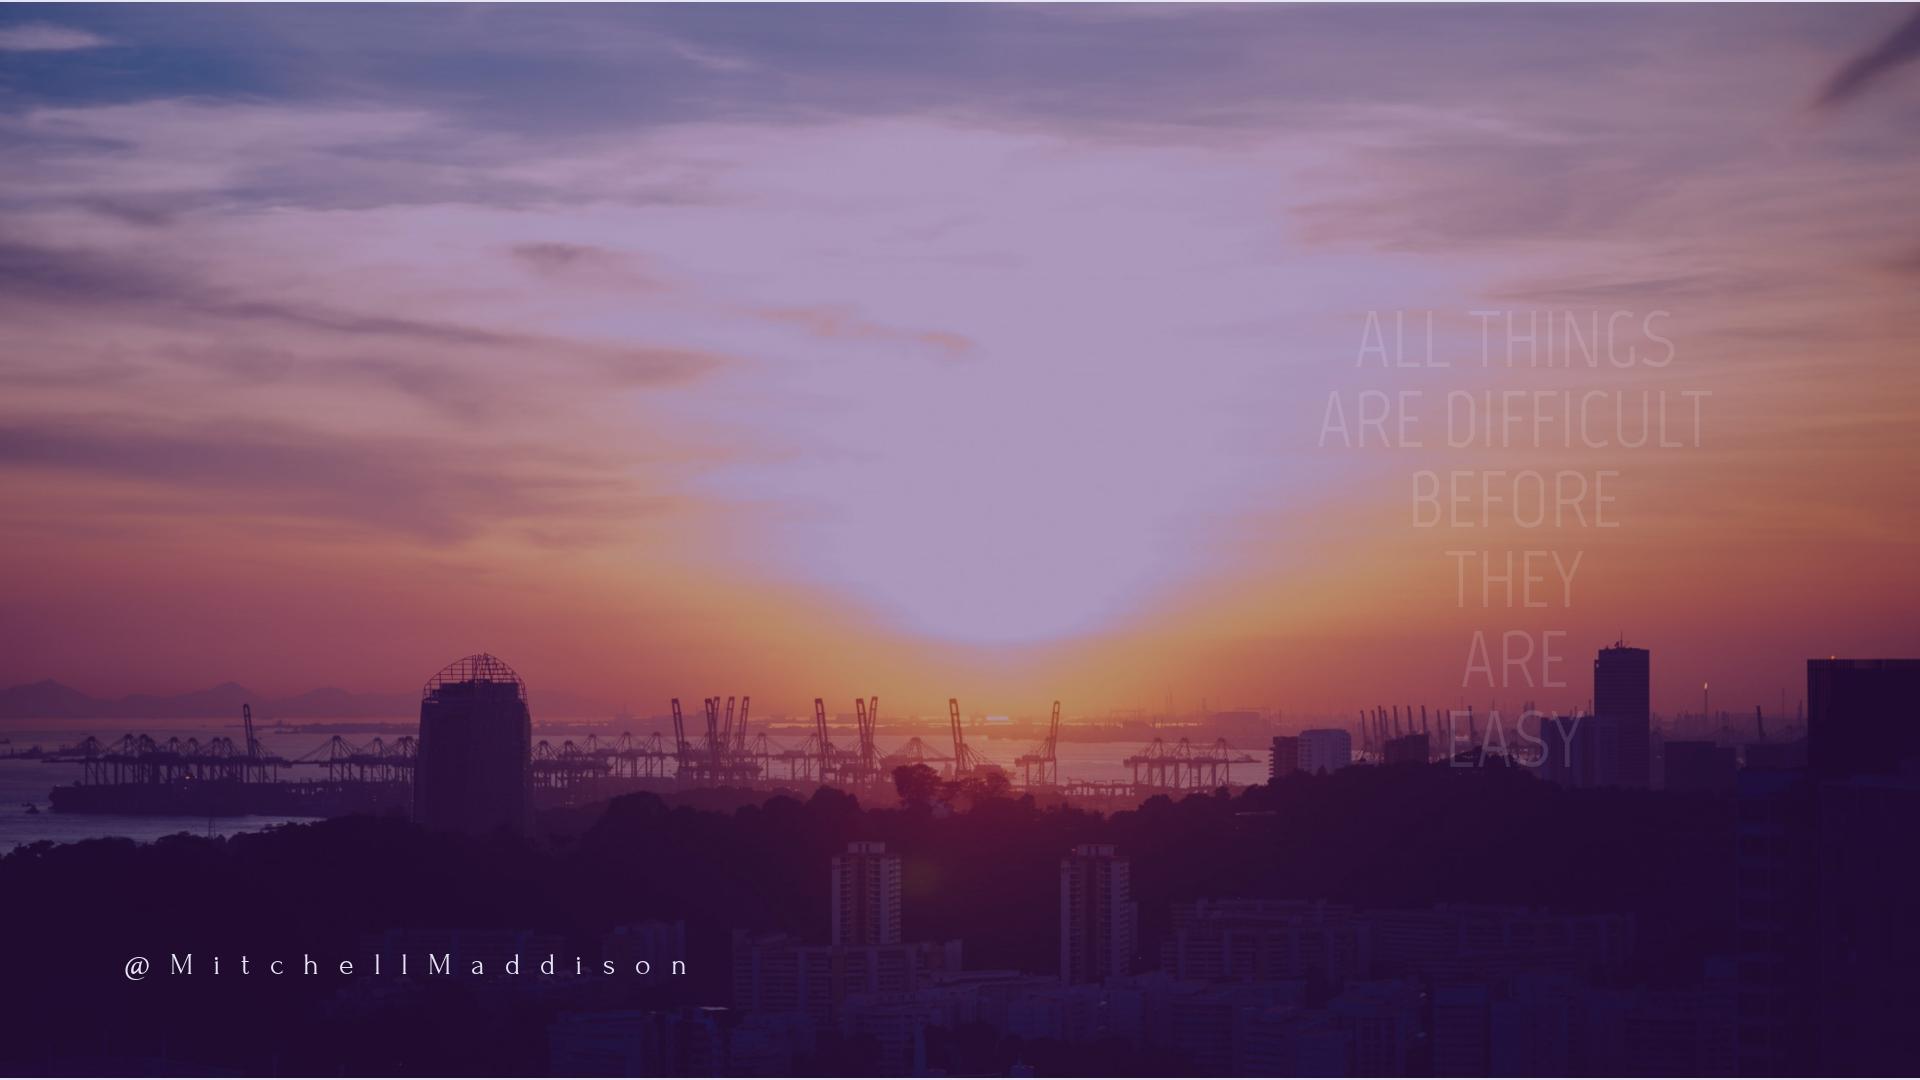 Harbour, Ocean, Skyscraper, Sunset, Sunrise, City, Cloud, Mountain, Wording, Saying, Quote, CallToAction, White,  Free Image